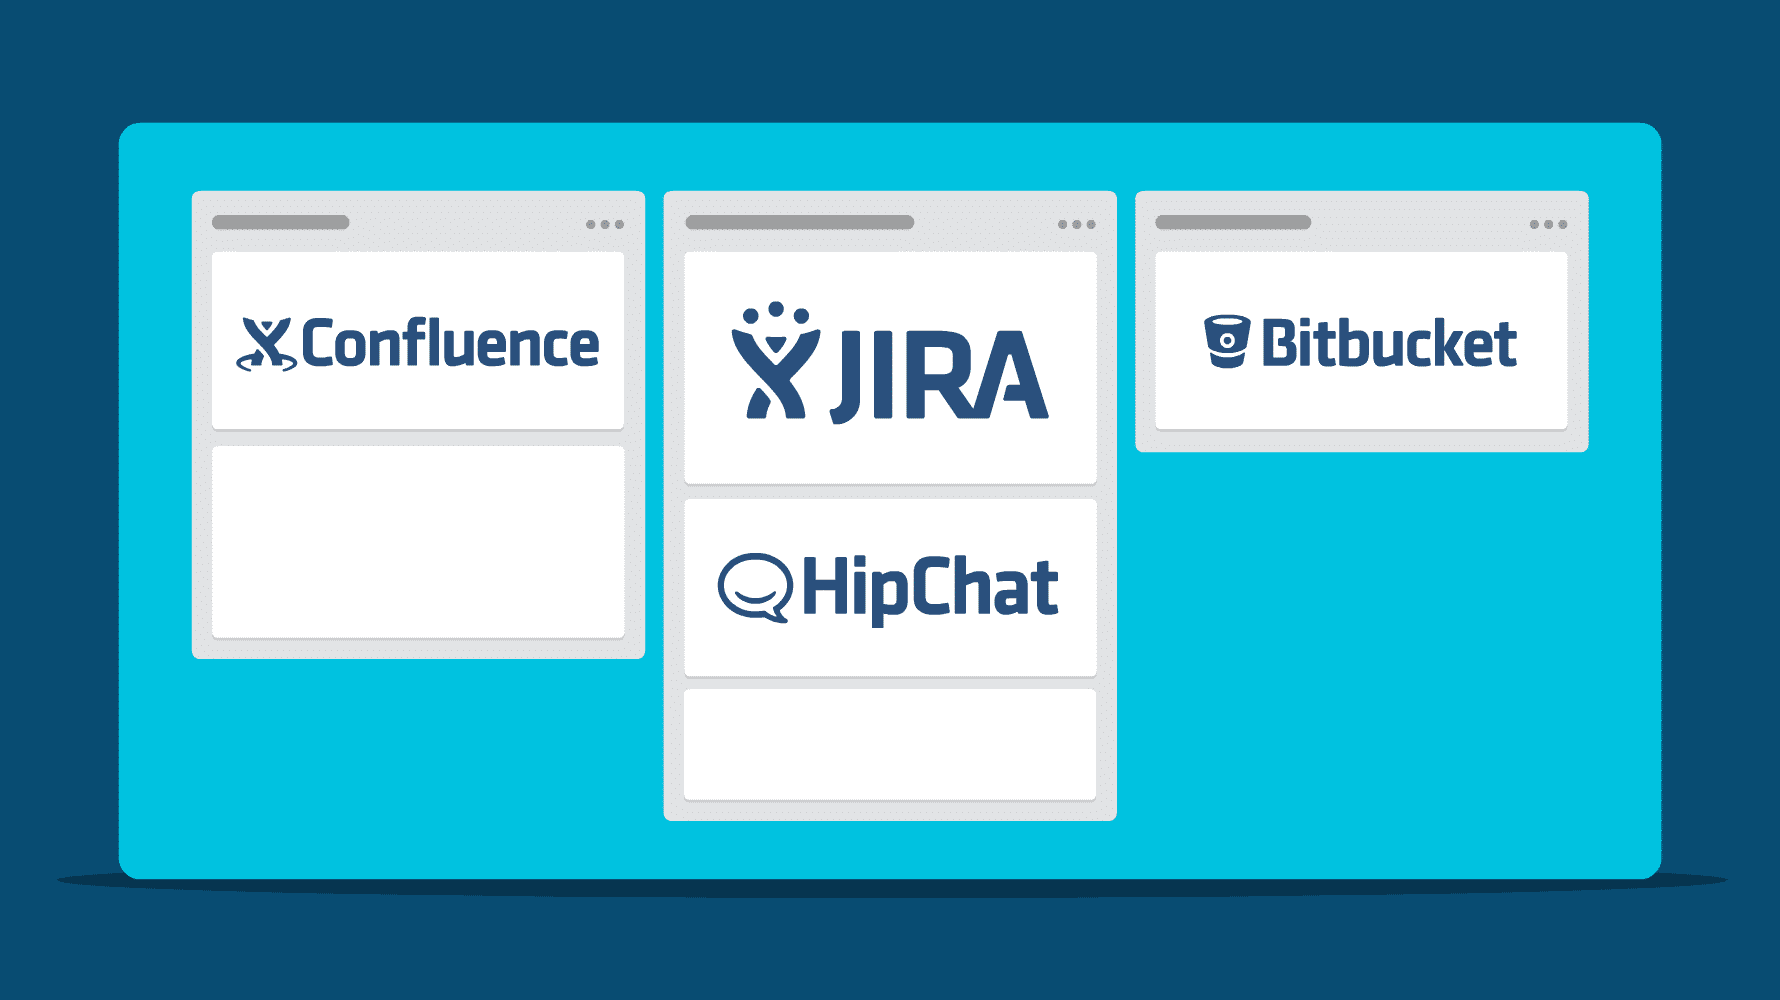 Atlassian integriert Trello in Bitbucket, Confluence, HipChat und JIRA